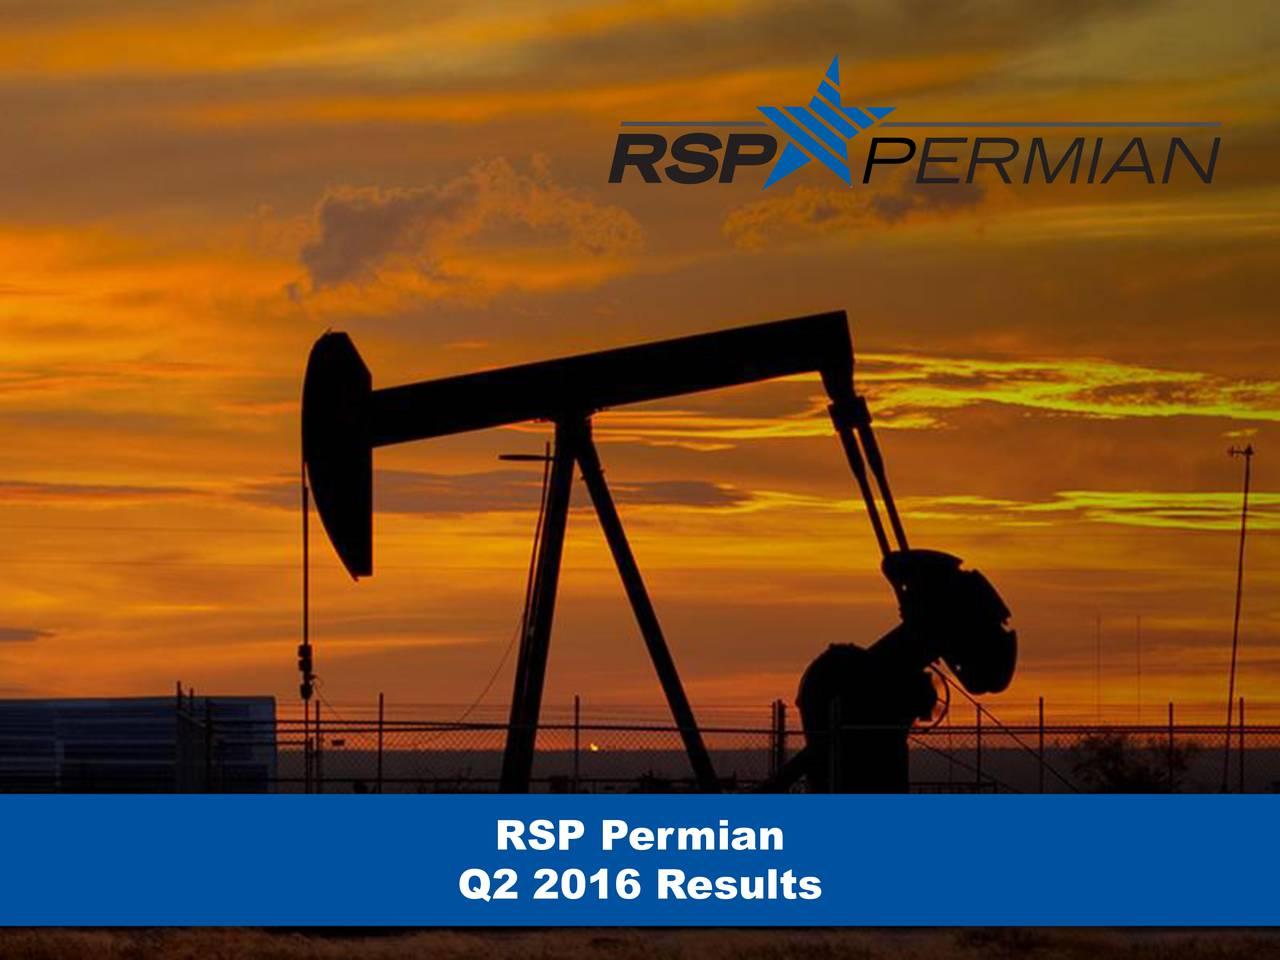 Q2 2016 Results